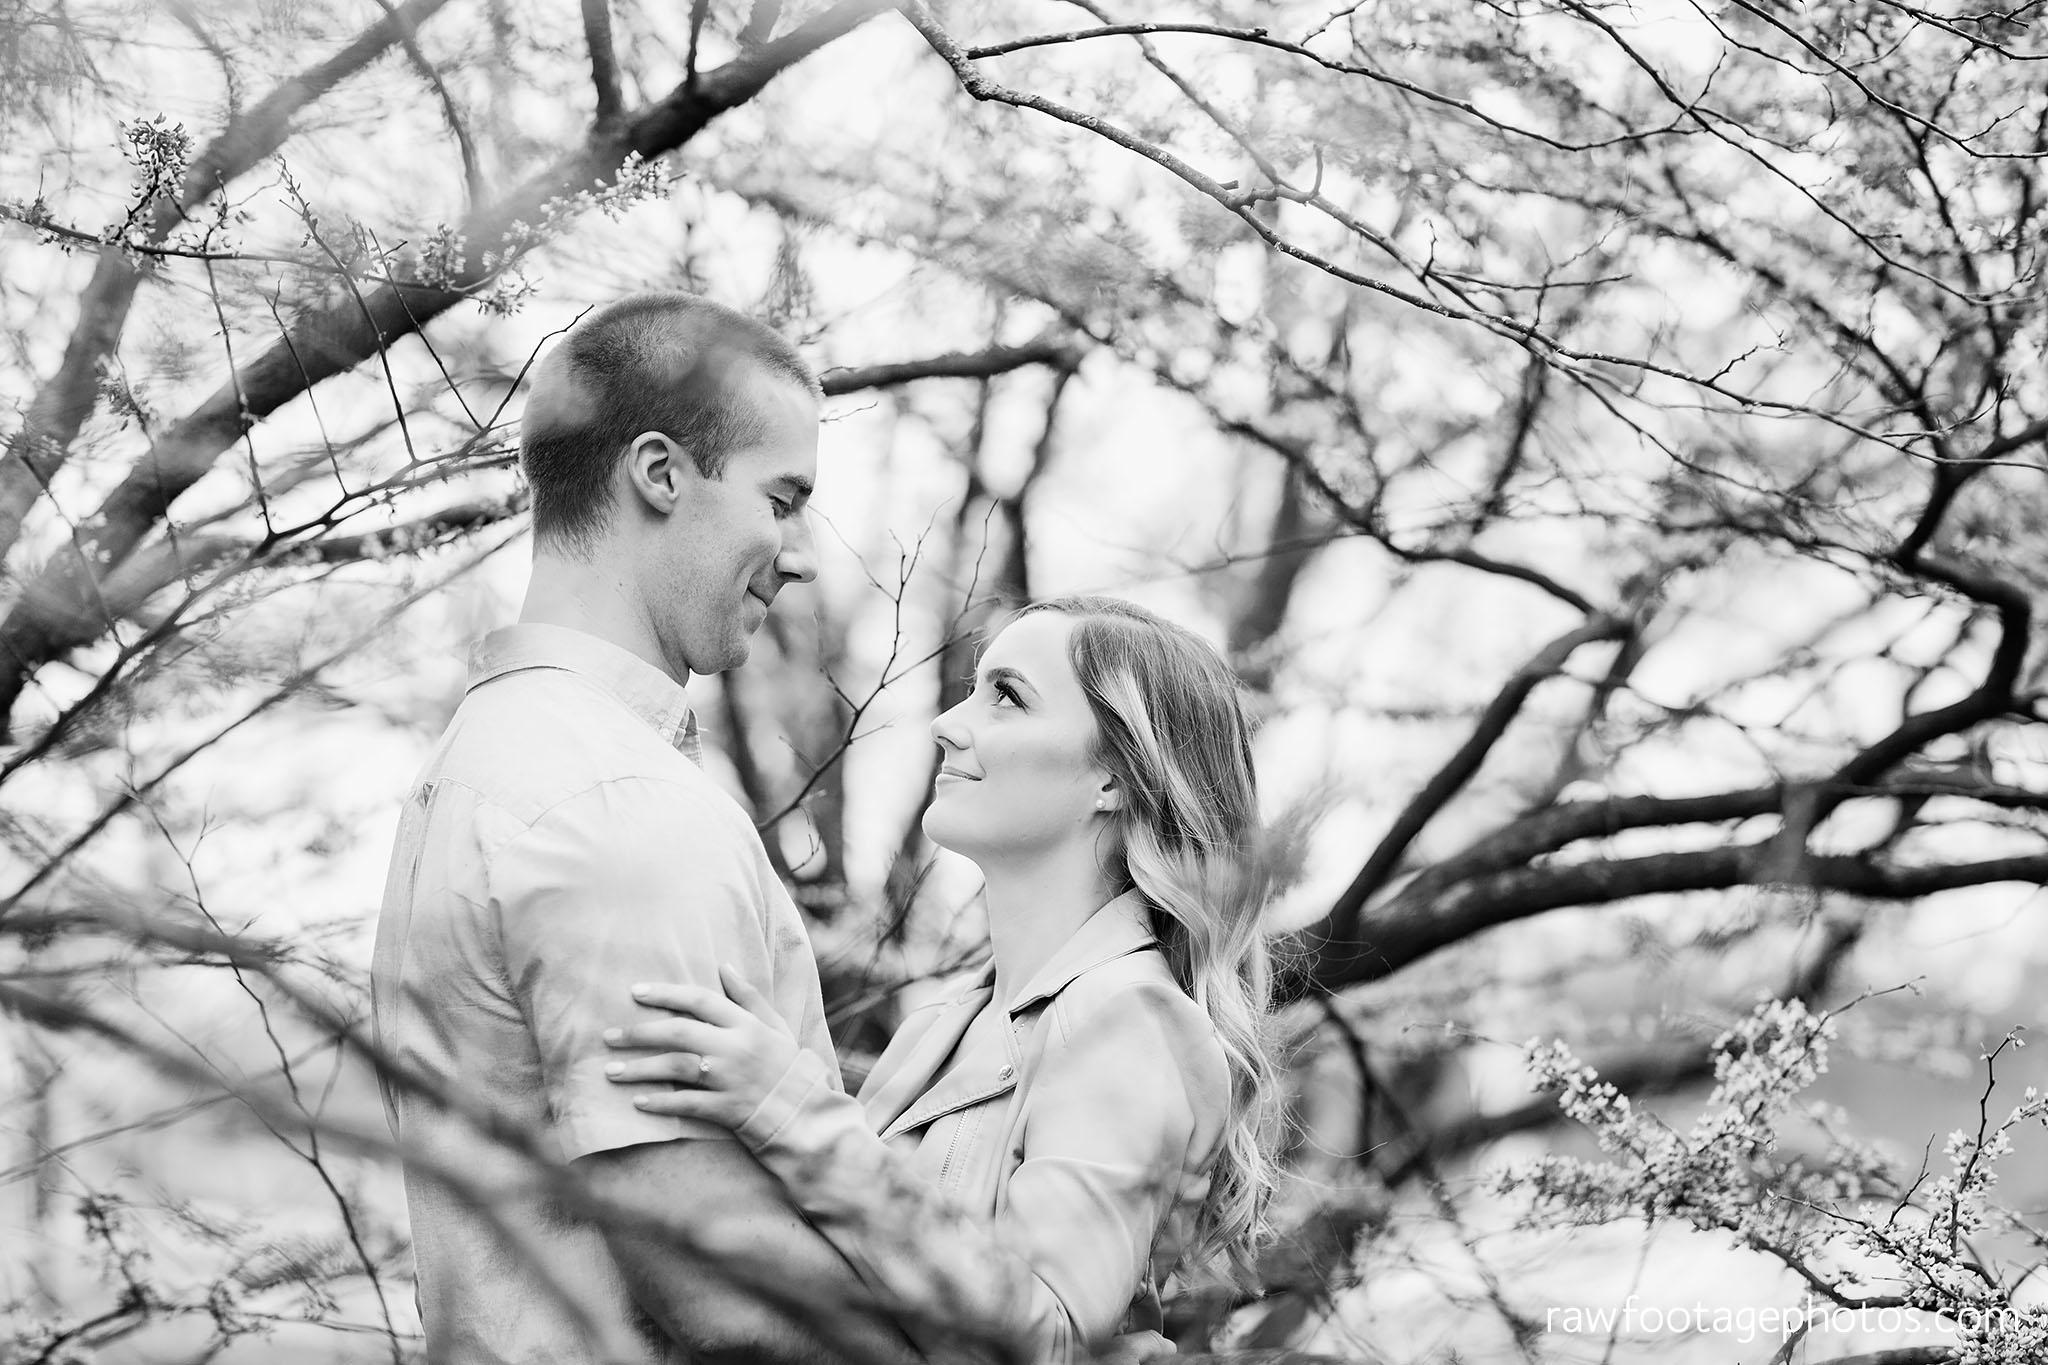 london_ontario_wedding_photographer-raw_footage_photography-engagement_session-engagement_photos-spring-blossoms-blooms015.jpg